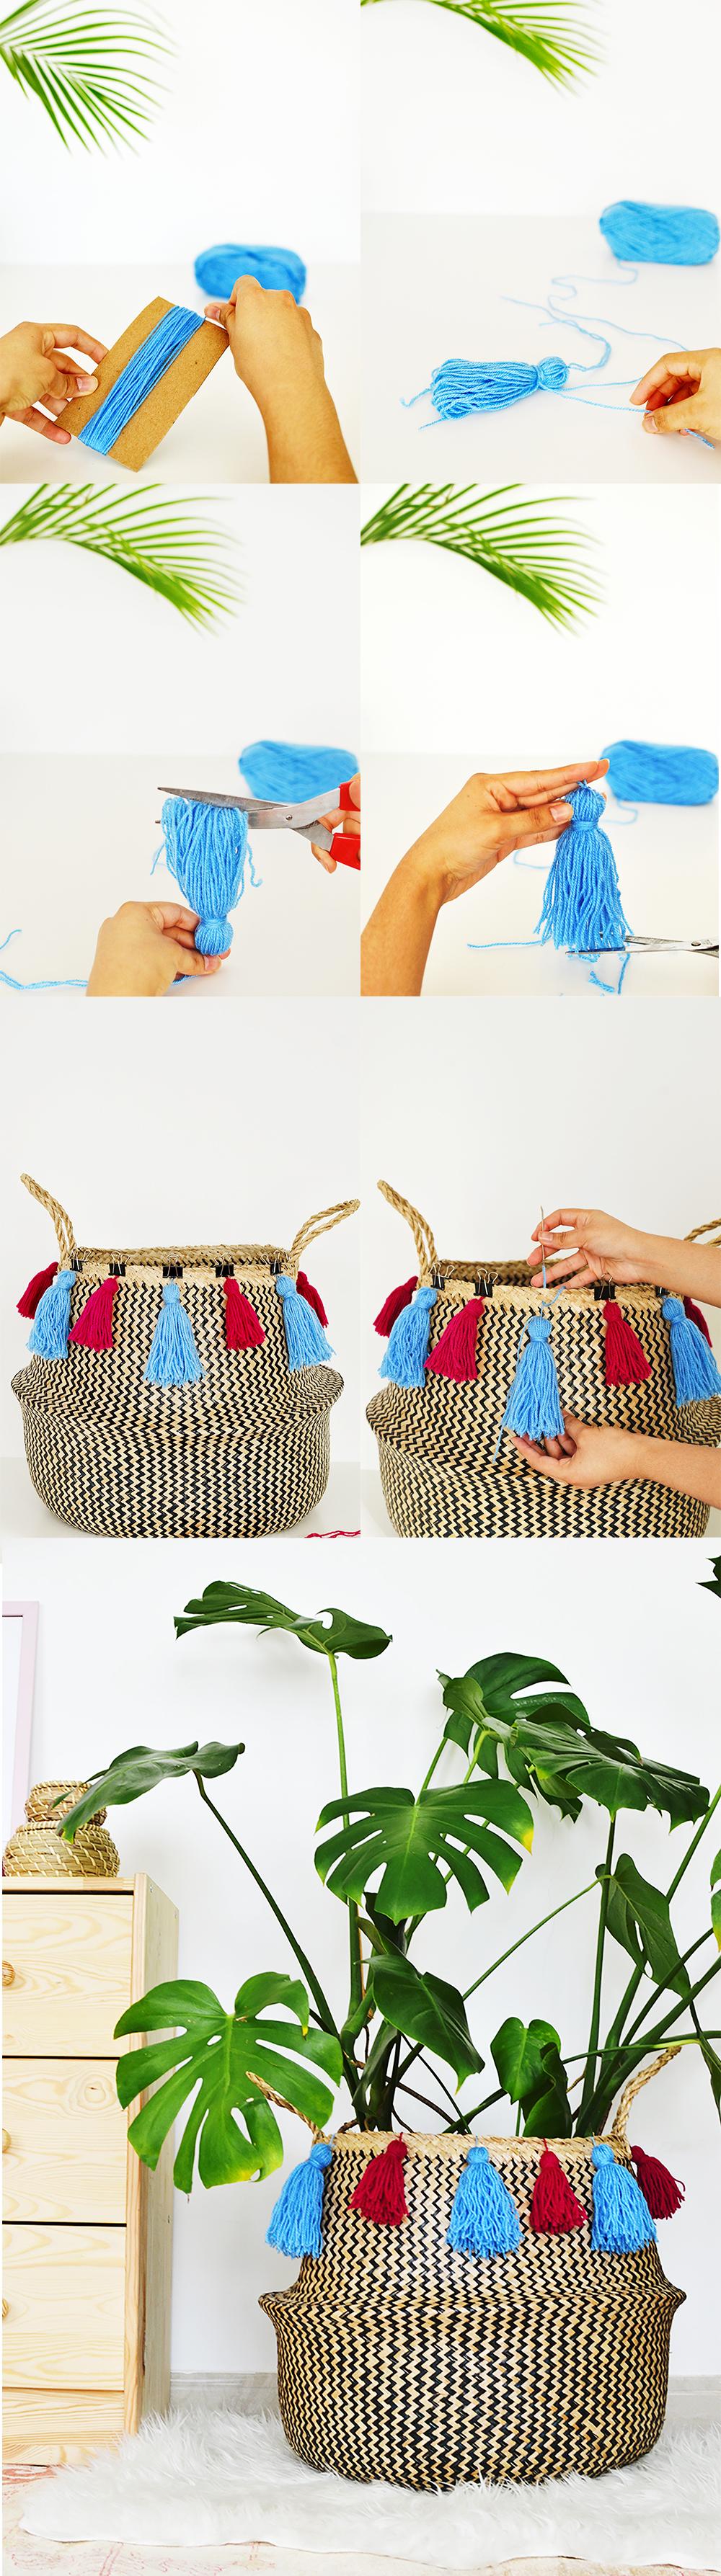 Diy tasseled sea grass basket cl 1